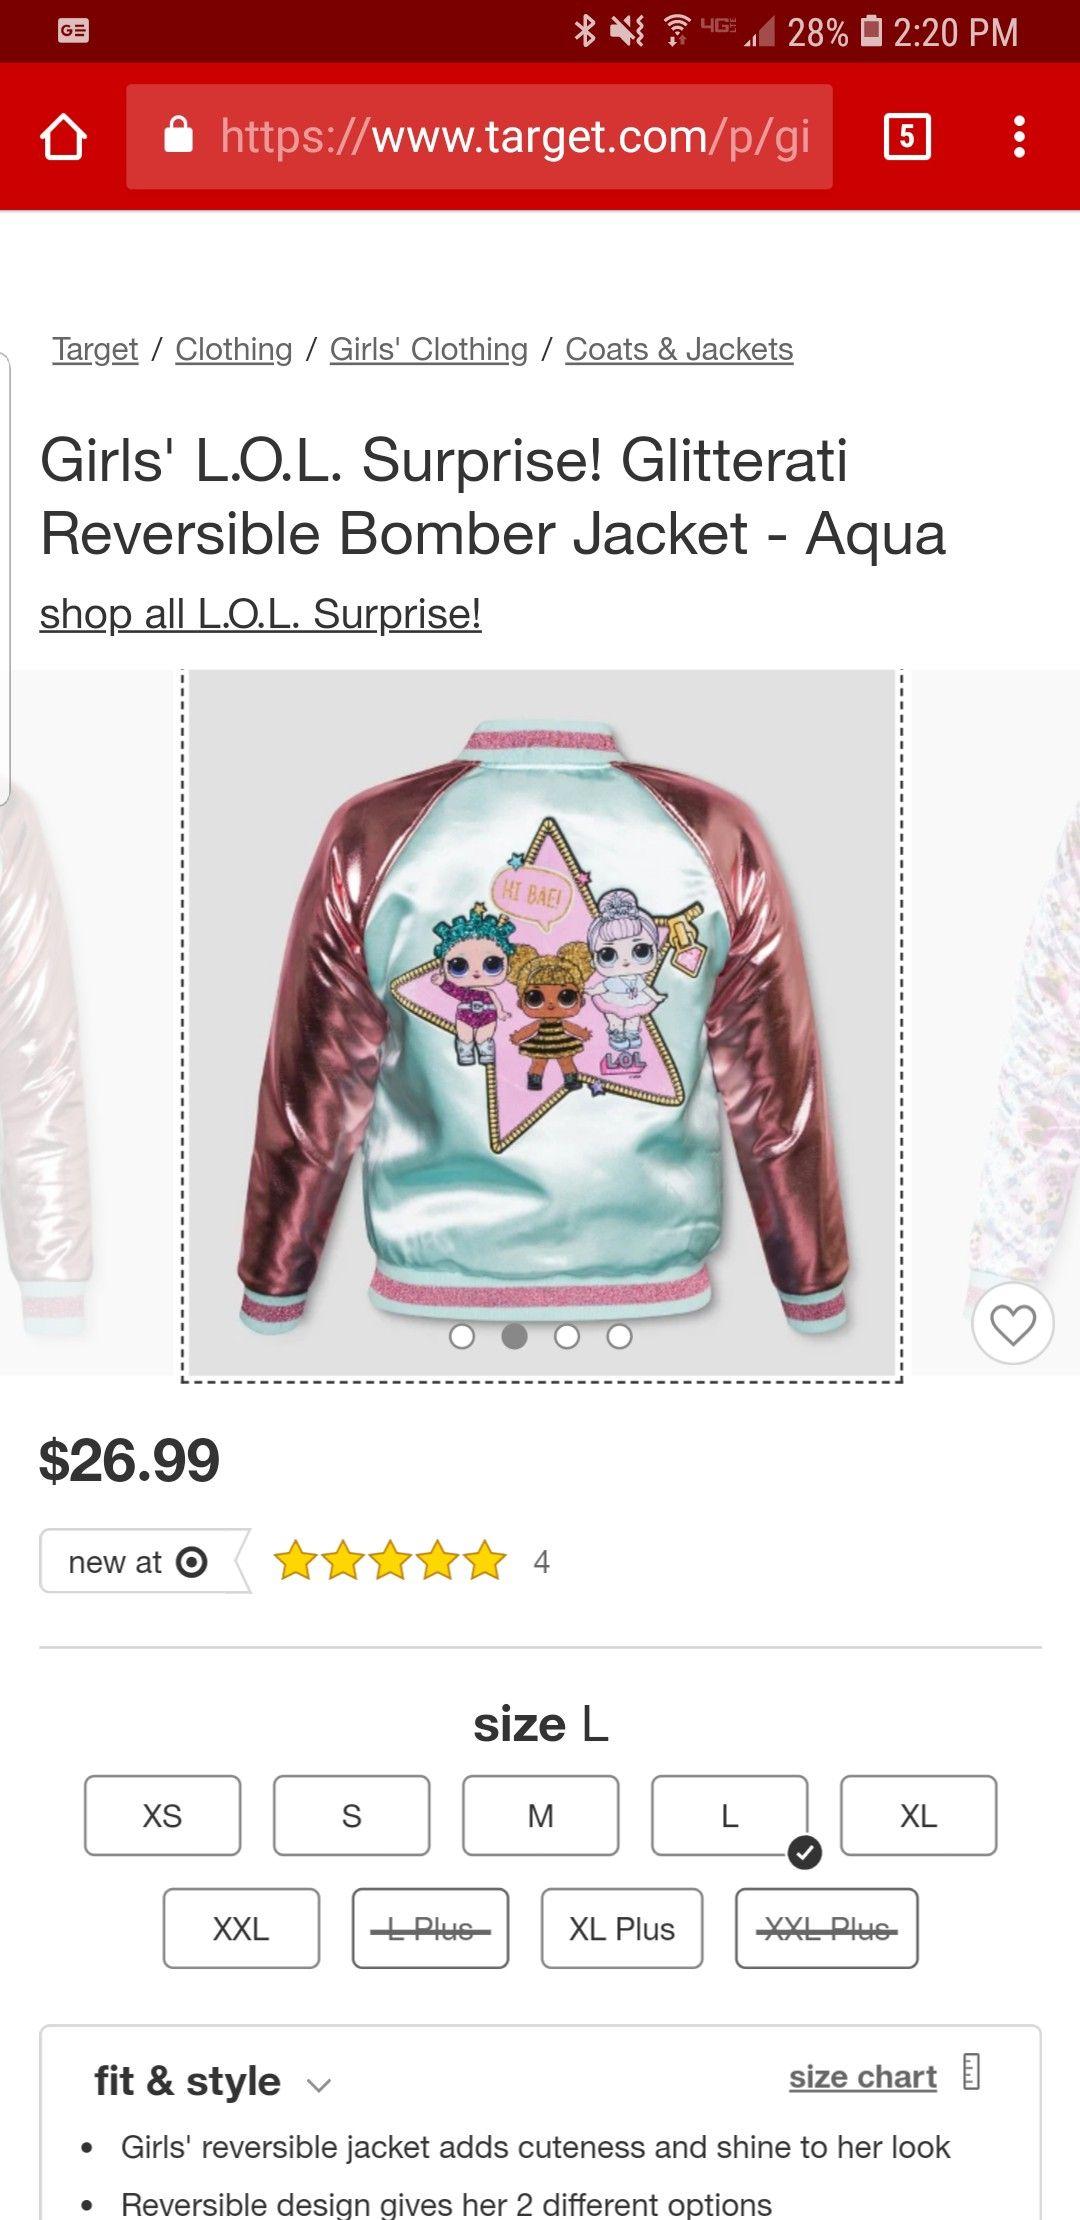 Lol Surprise Doll Bomber Jacket Target Clothes Girls Jacket Reversible Jackets [ 2220 x 1080 Pixel ]